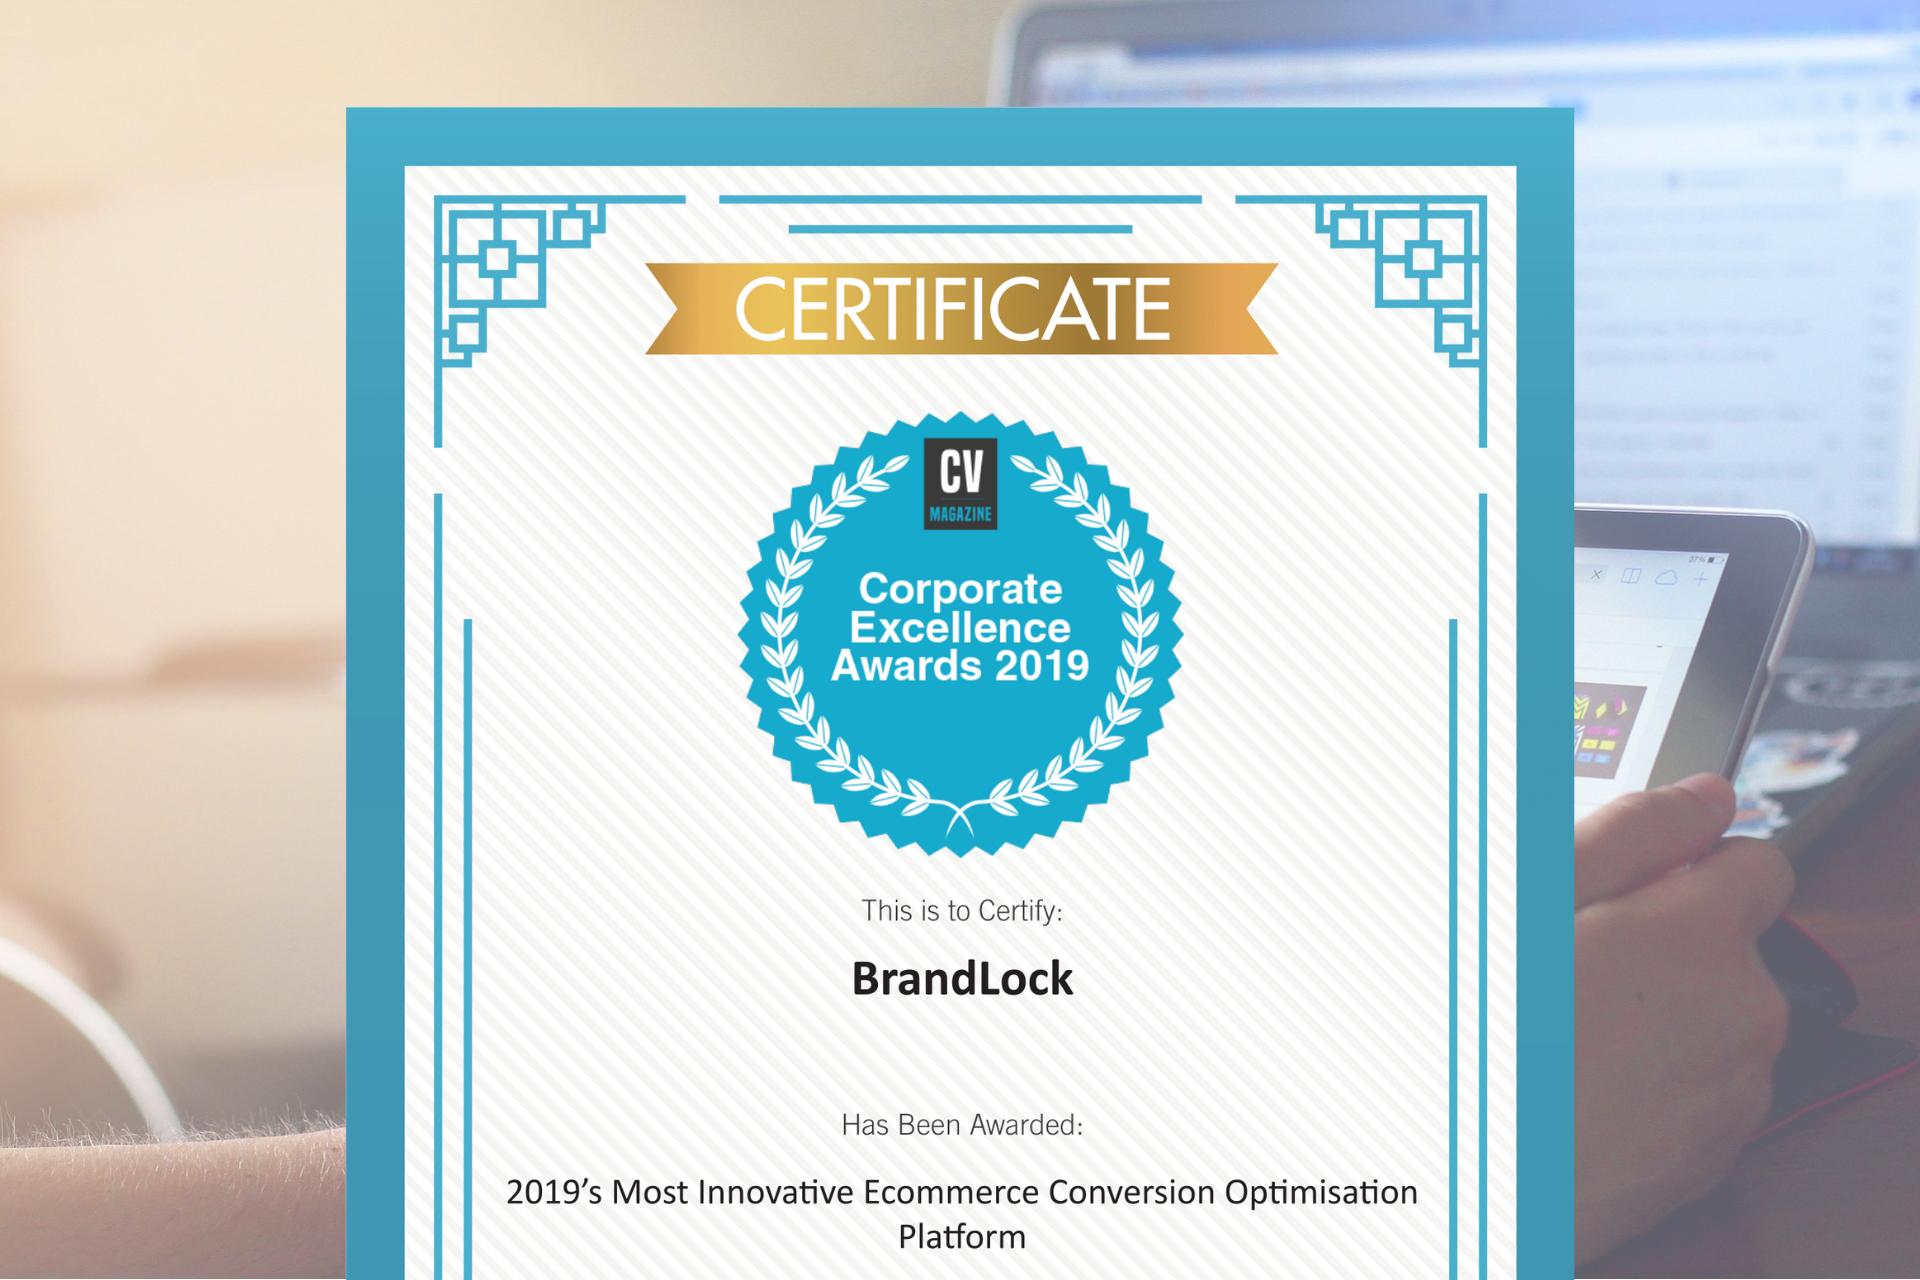 BrandLock 2019's Most Innovative Ecommerce Conversion Optimization Platform